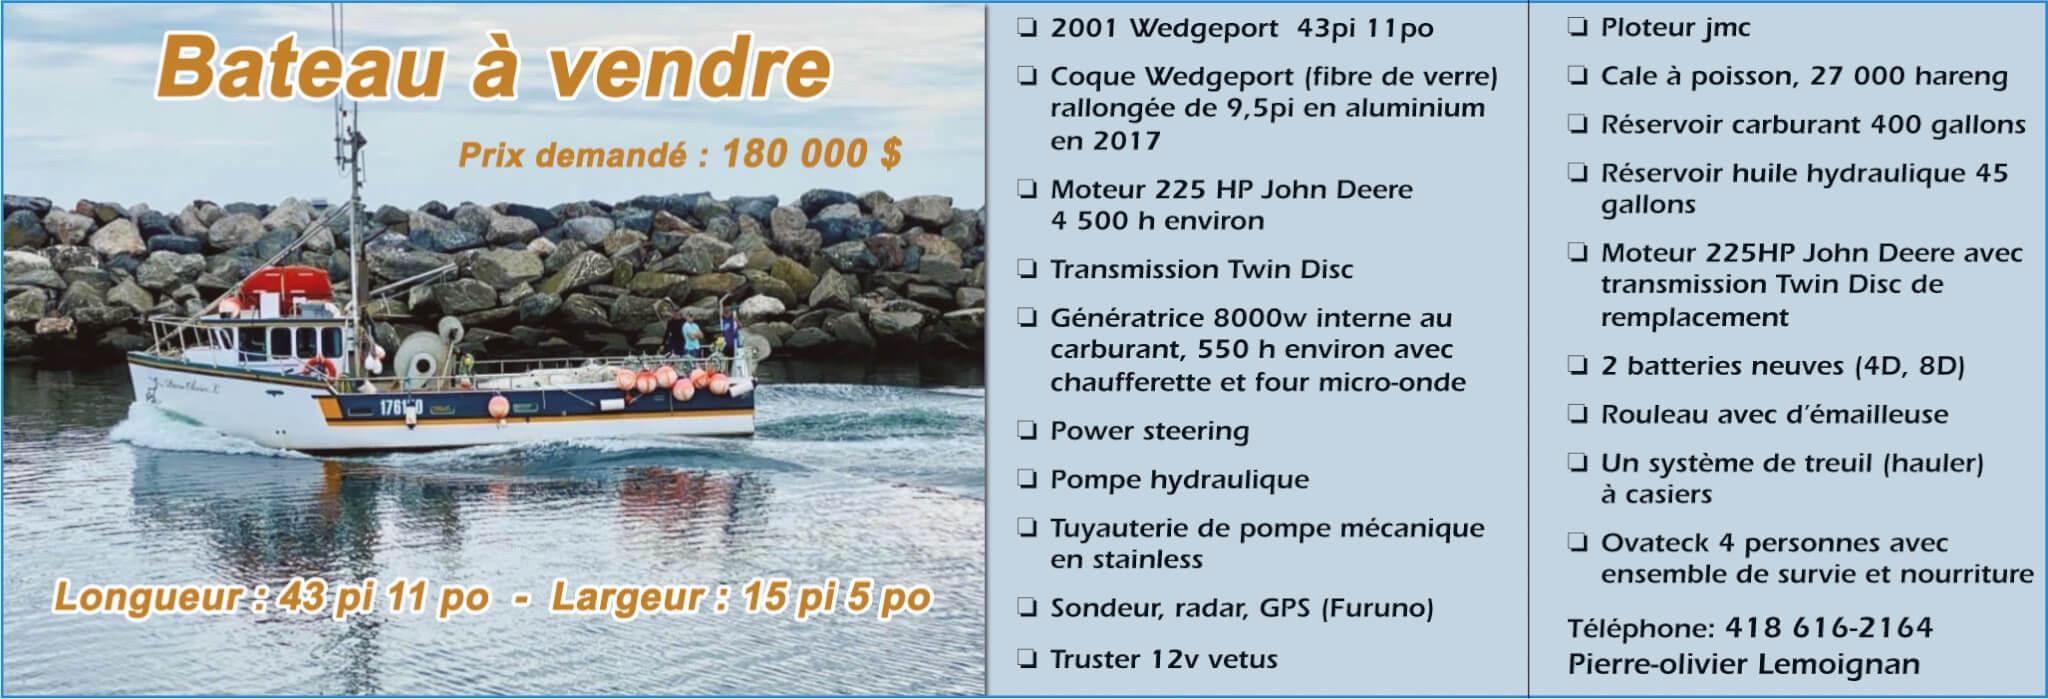 Bateau à vendre - Pierre-Olivier Lemoignan